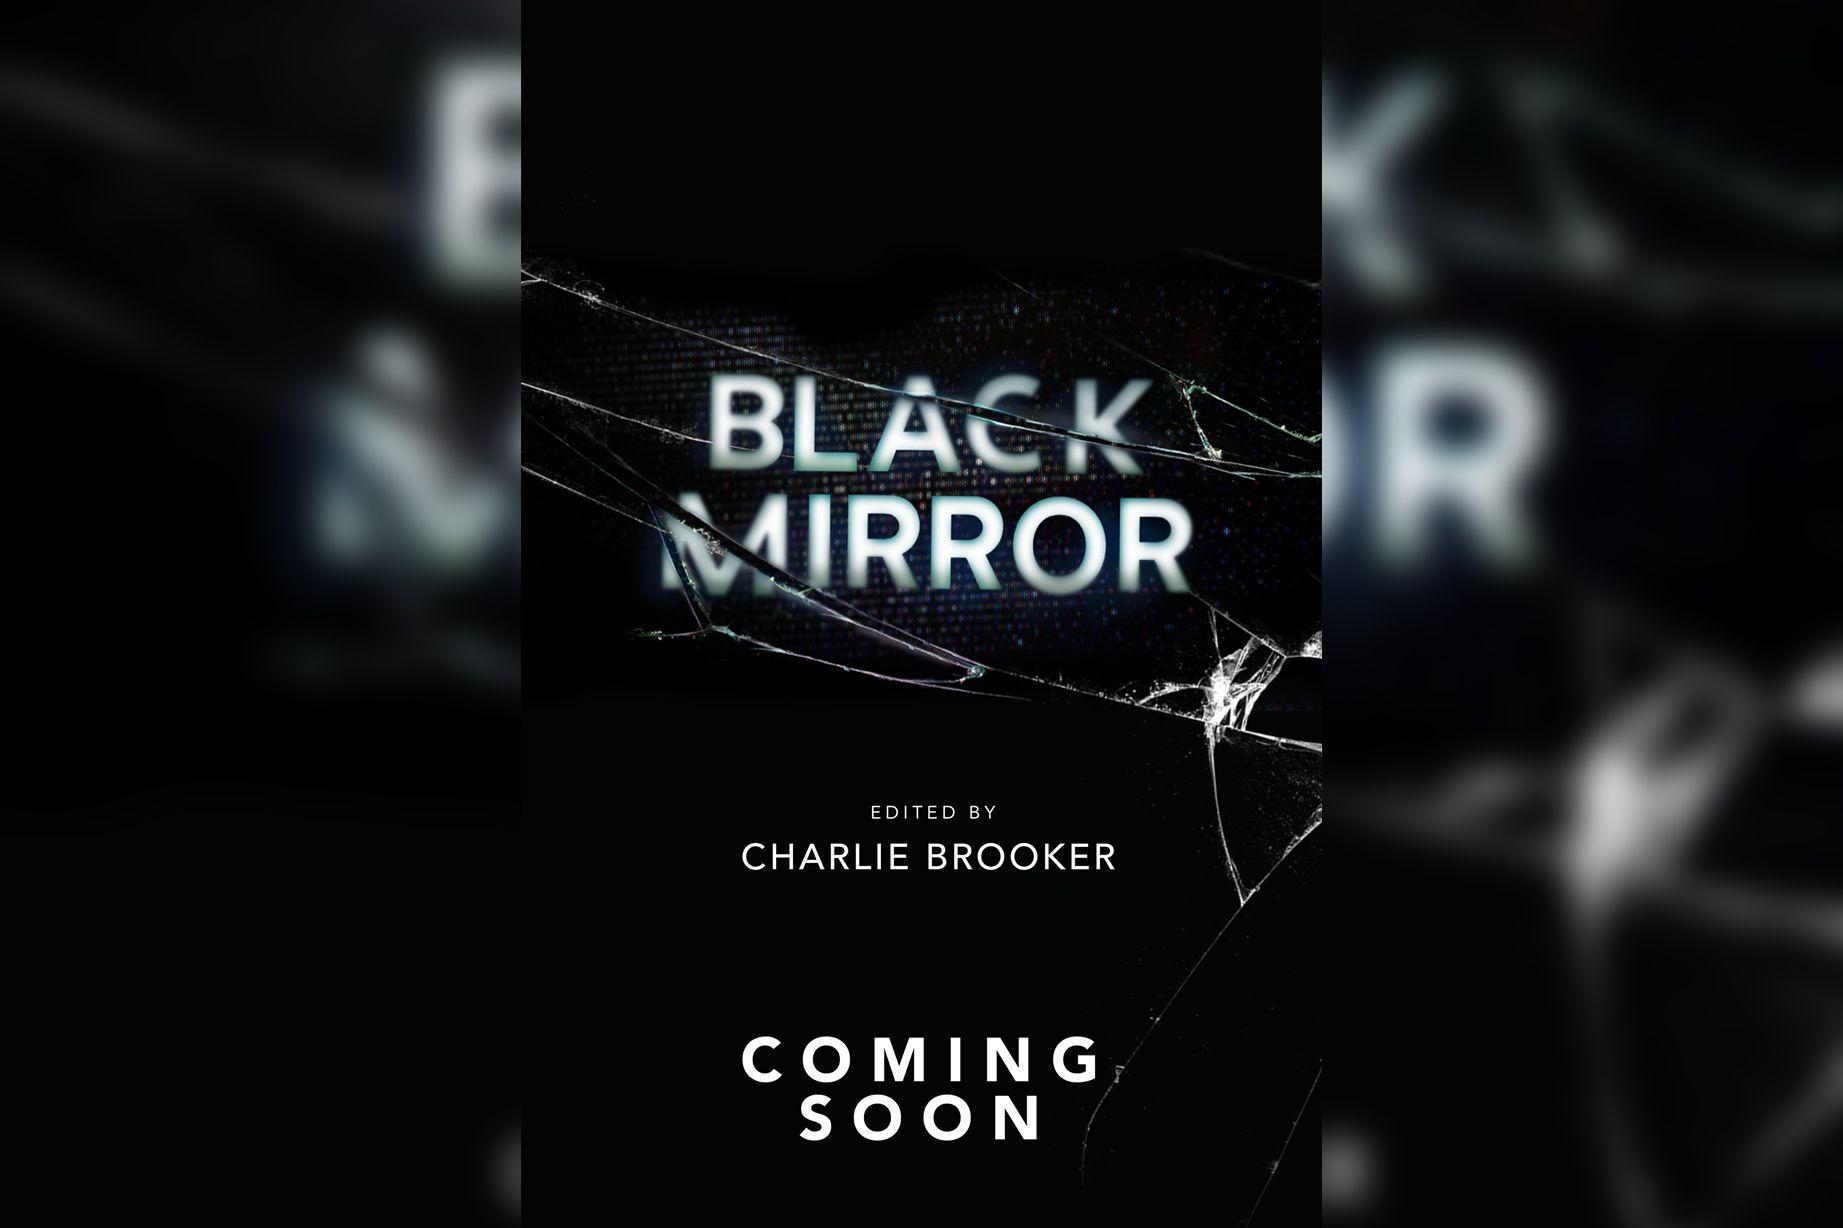 6-13-17 Black Mirror book series